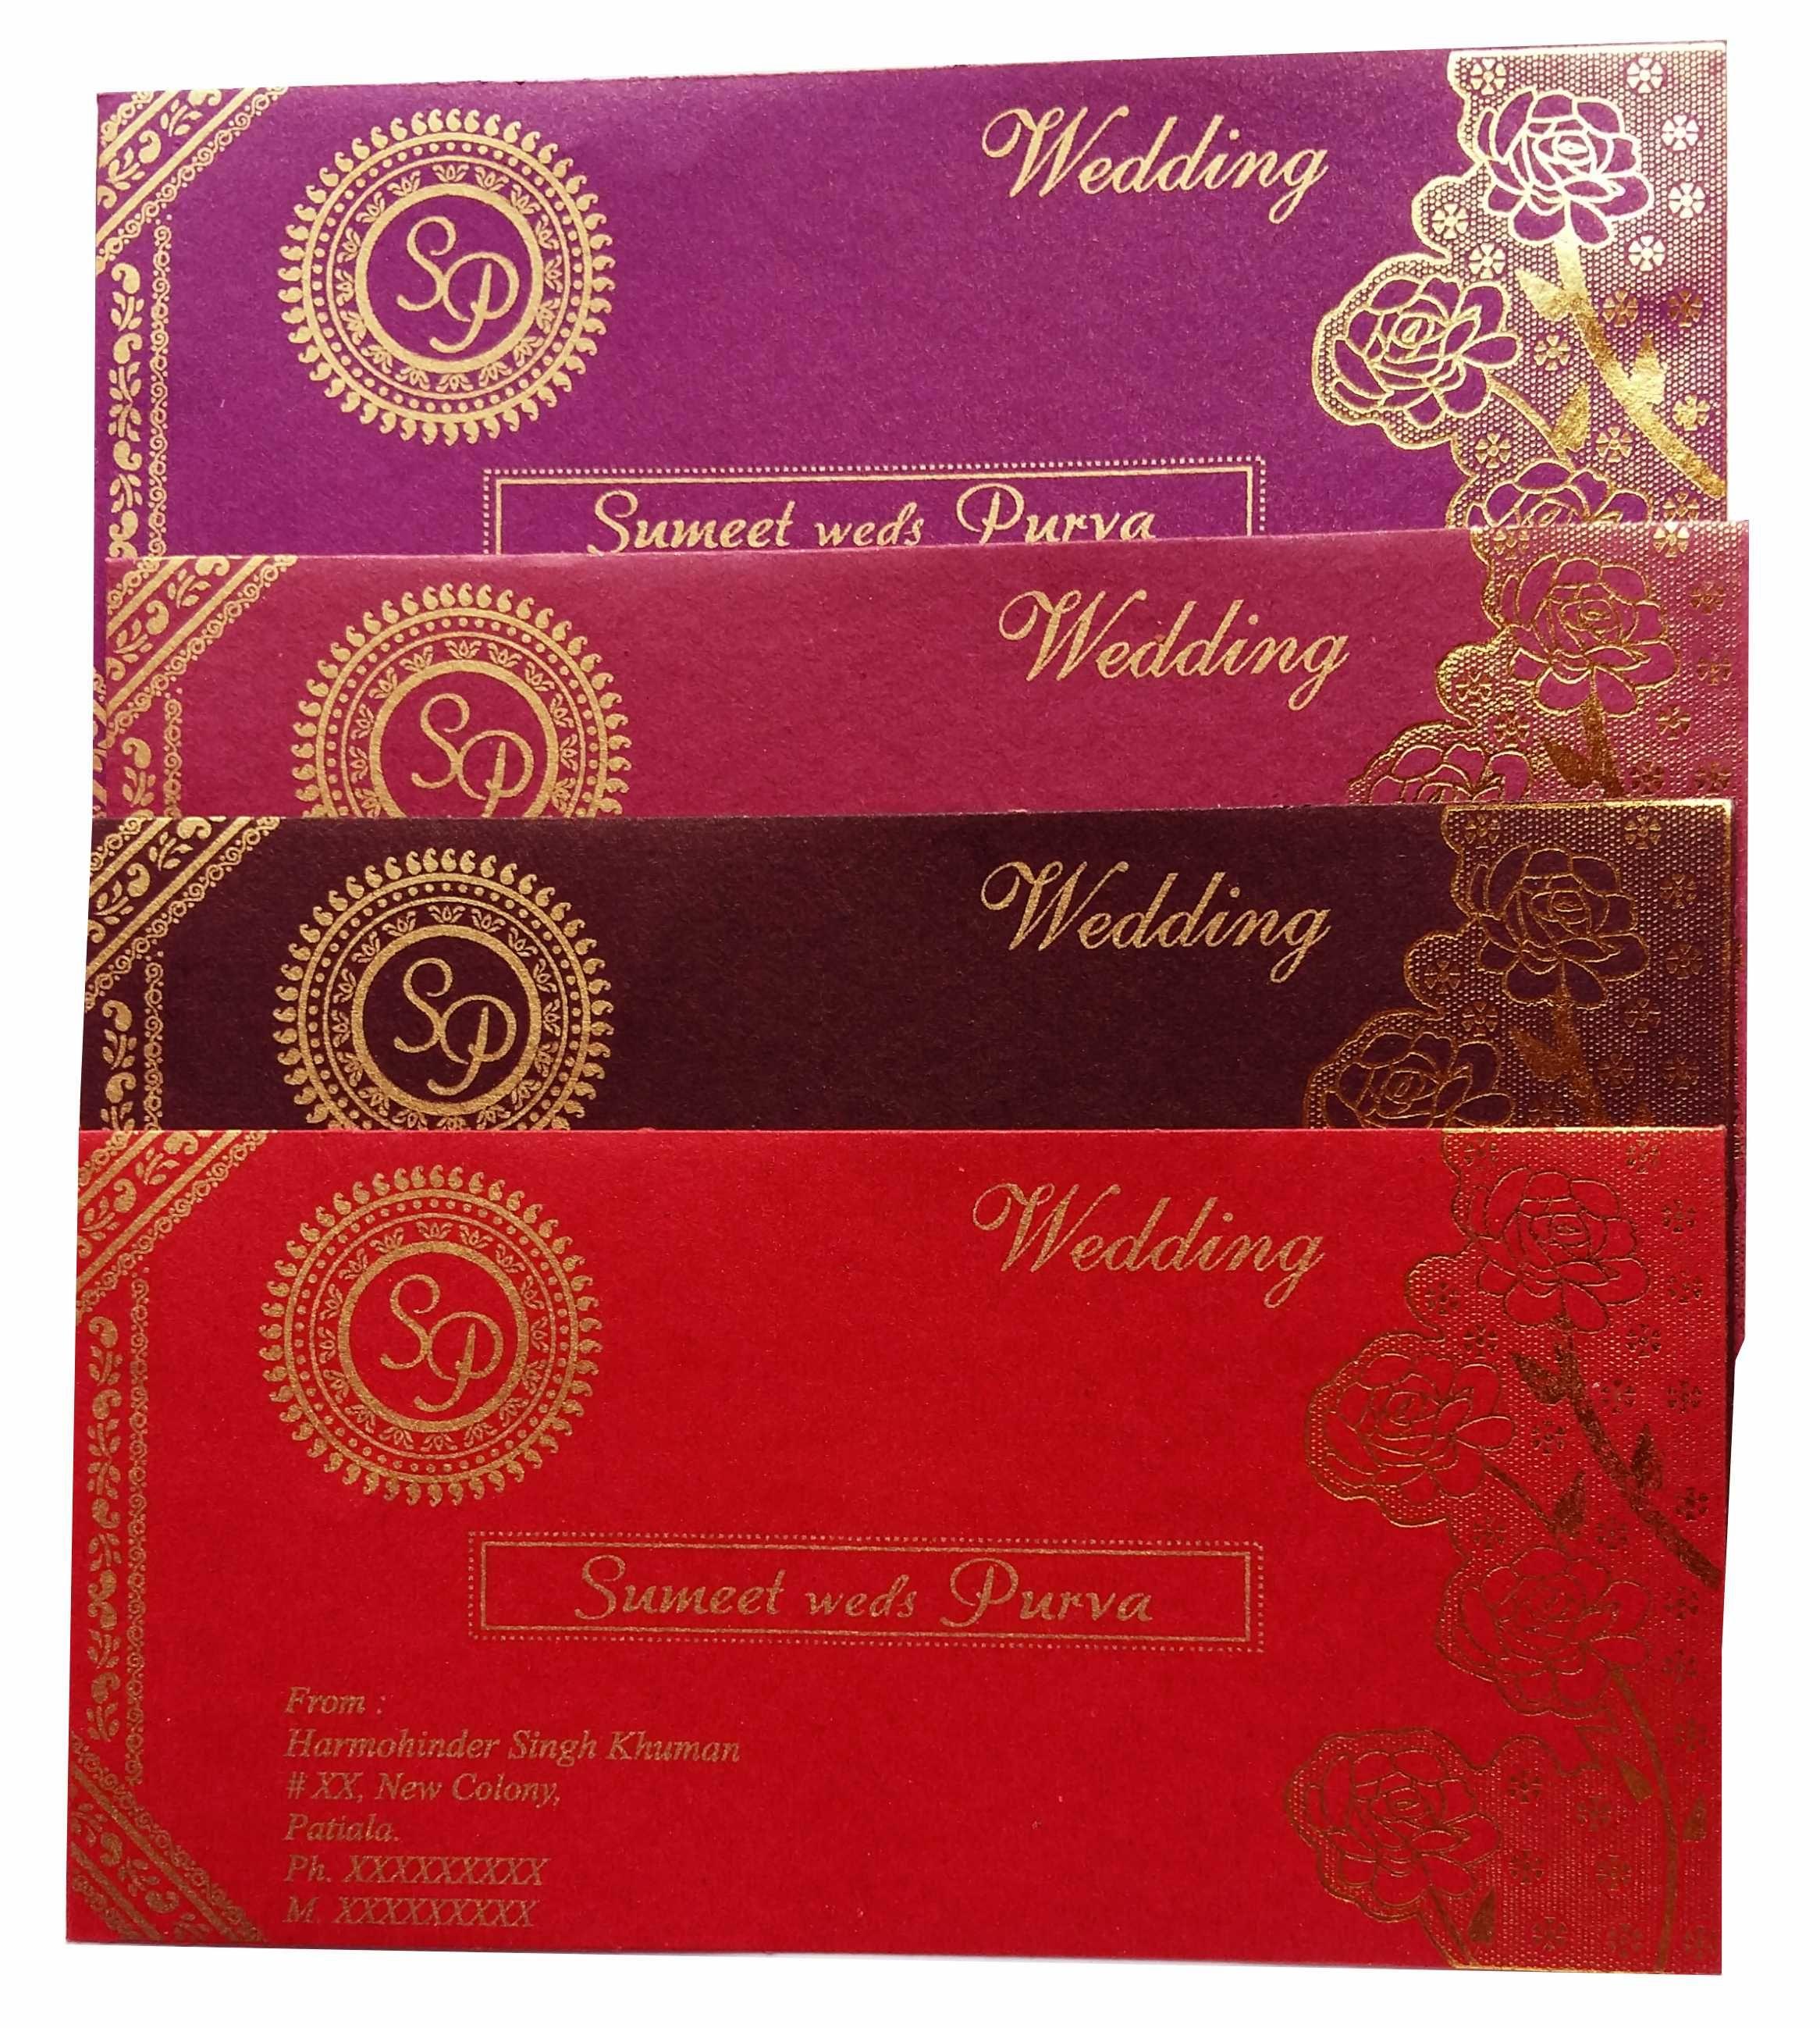 Designer Wedding Invitation Cards Exclusive Cardswedding Designwedding Images